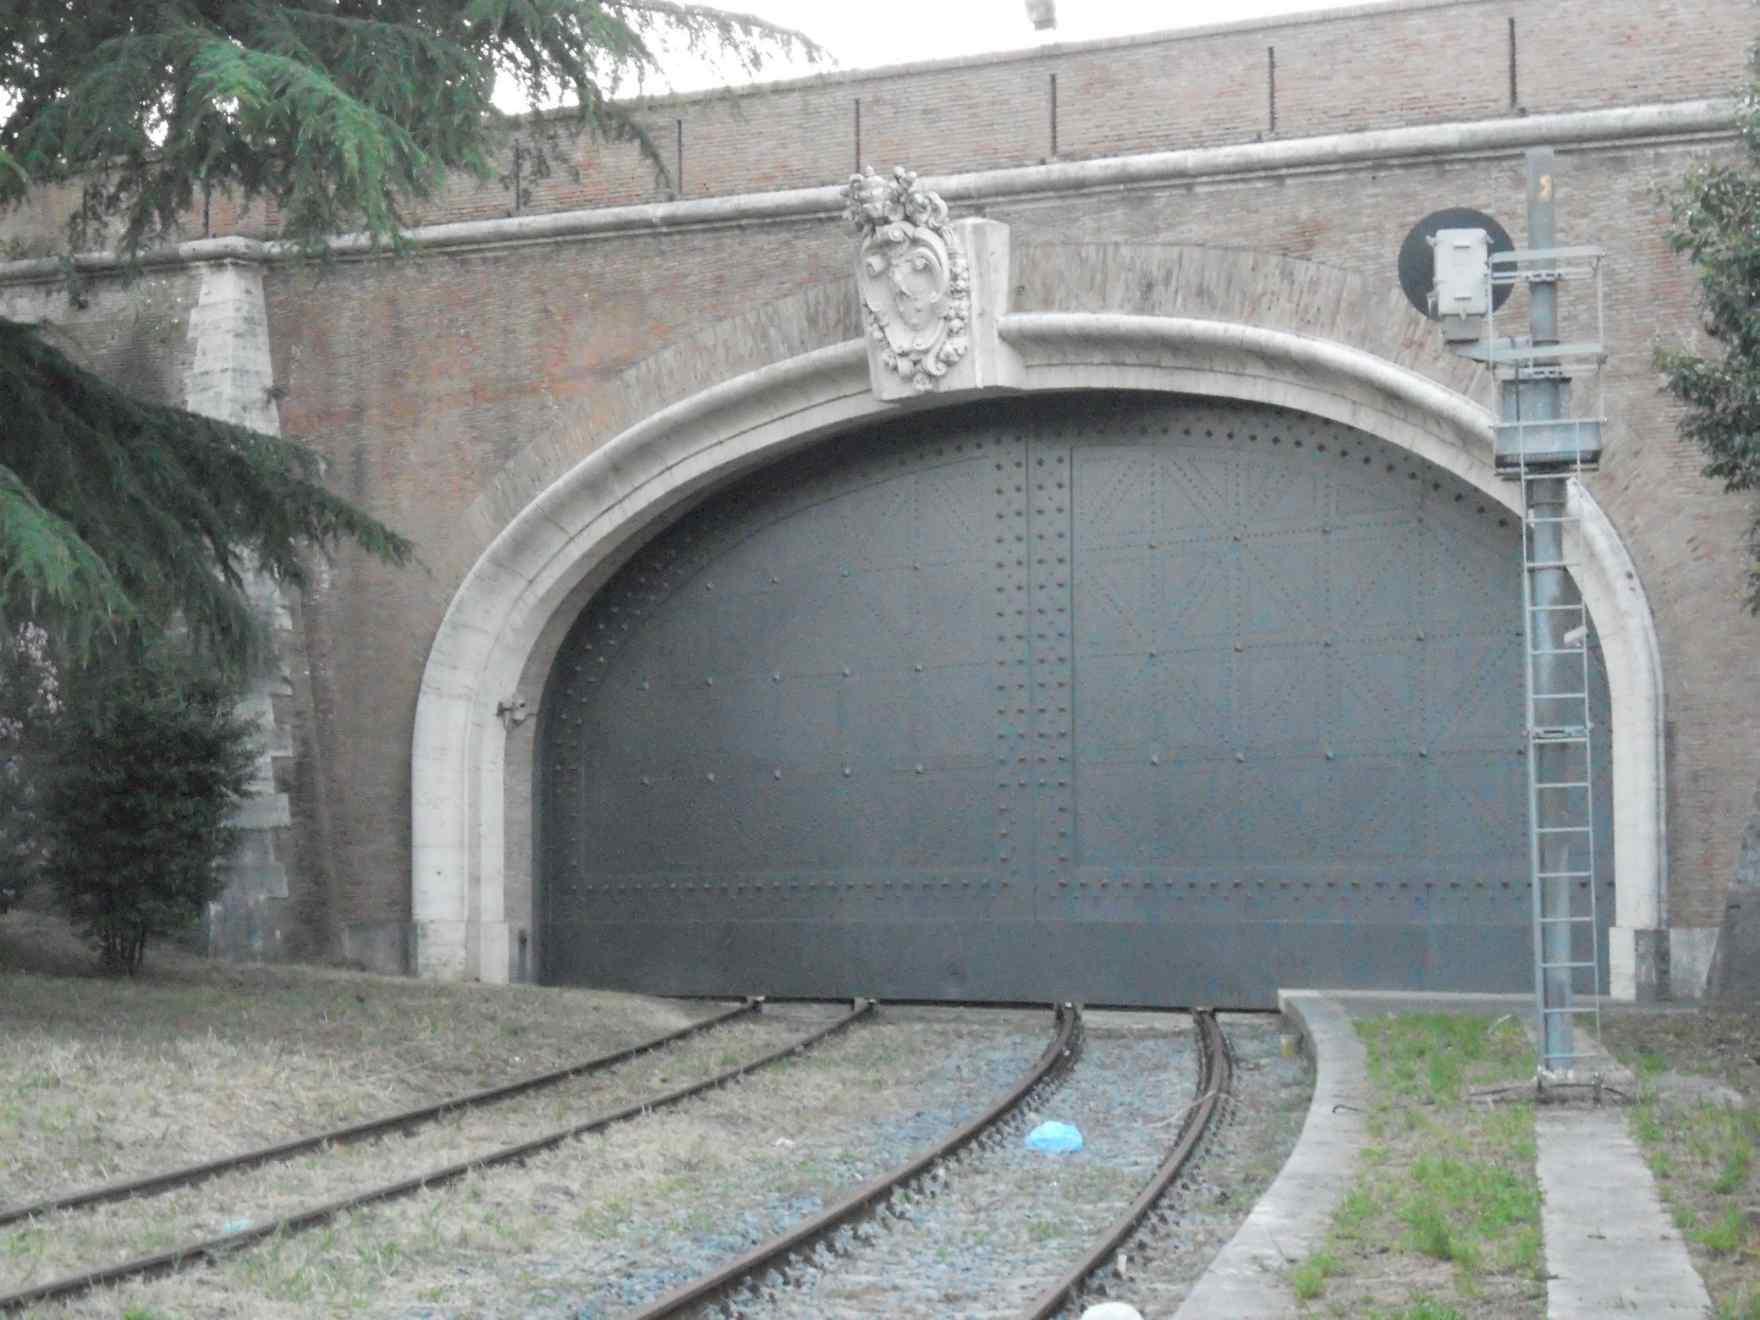 Tunnel-entrata-ferrovia-vaticata-blindato.jpg